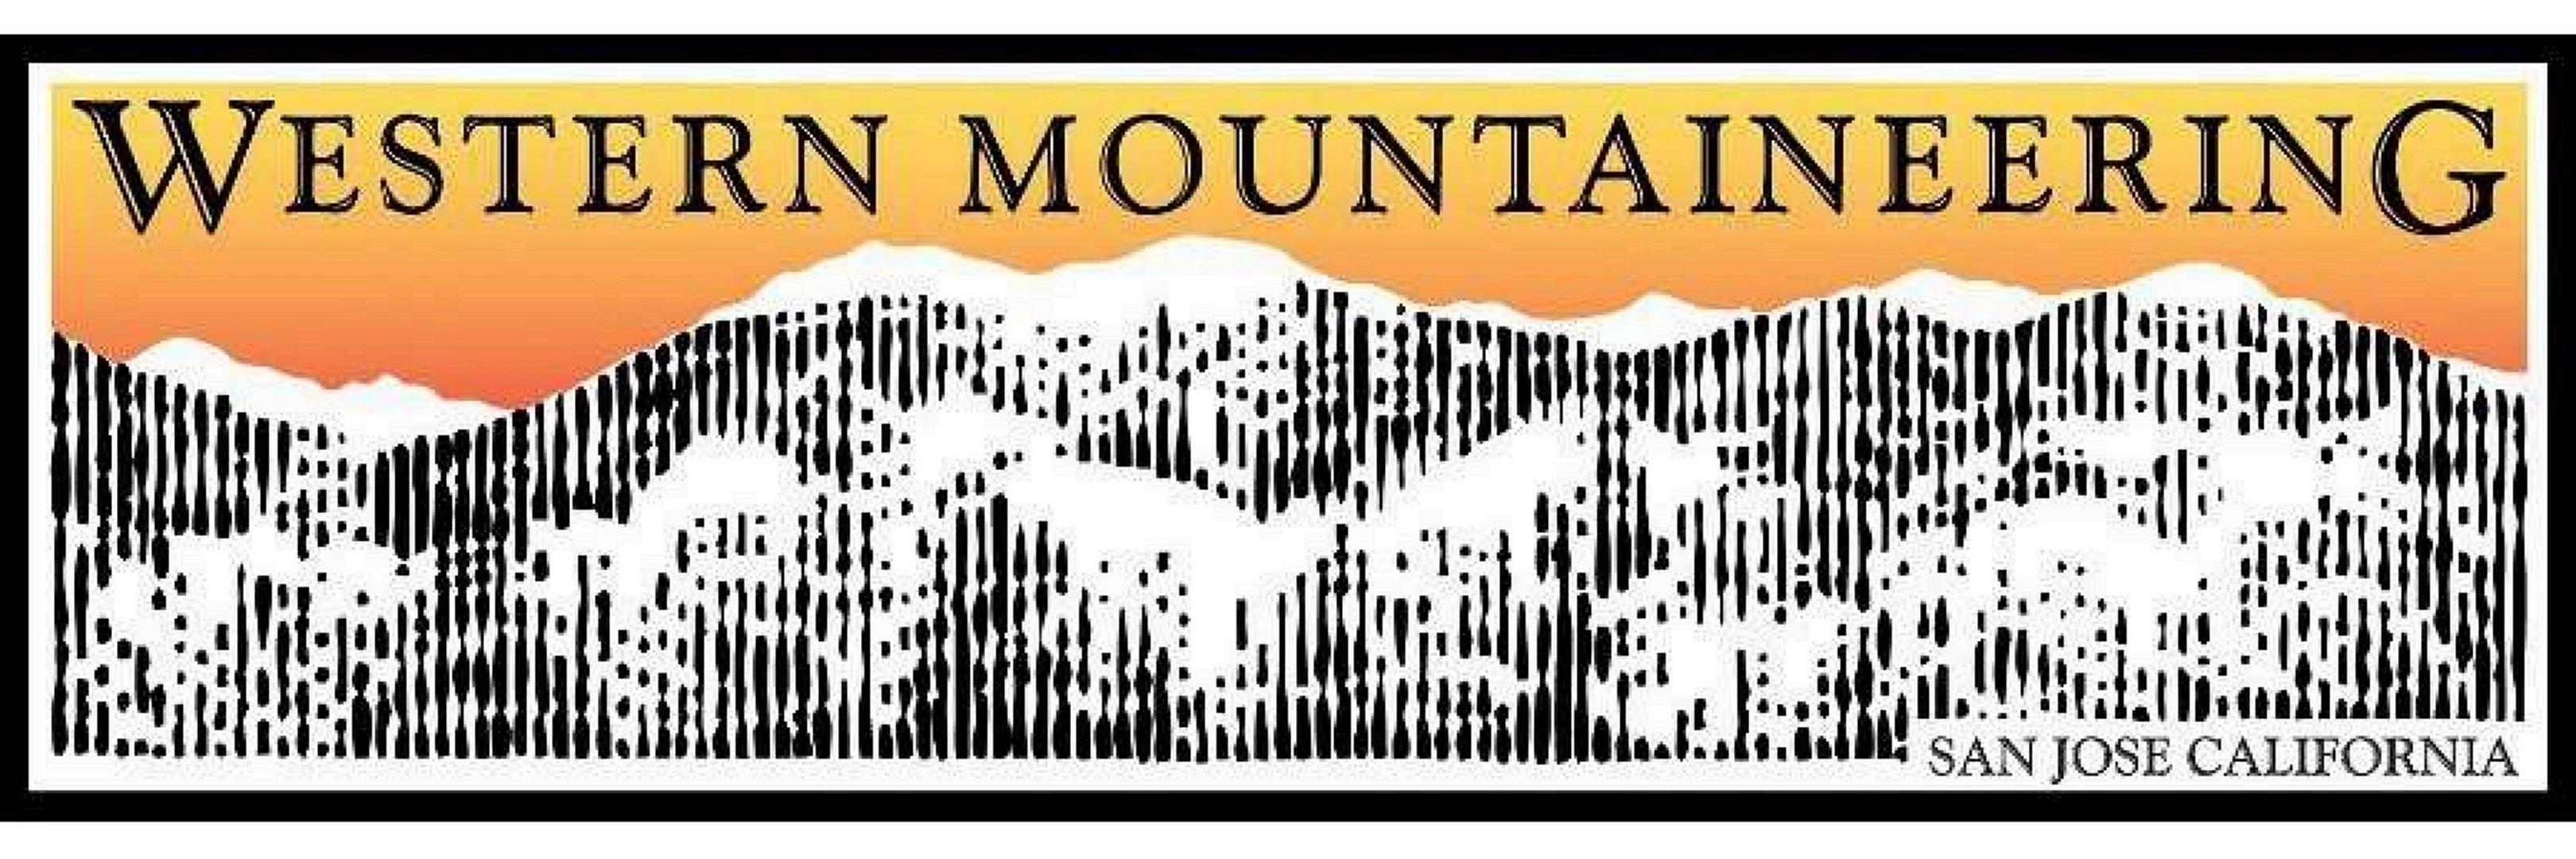 Western Mountaineering logo